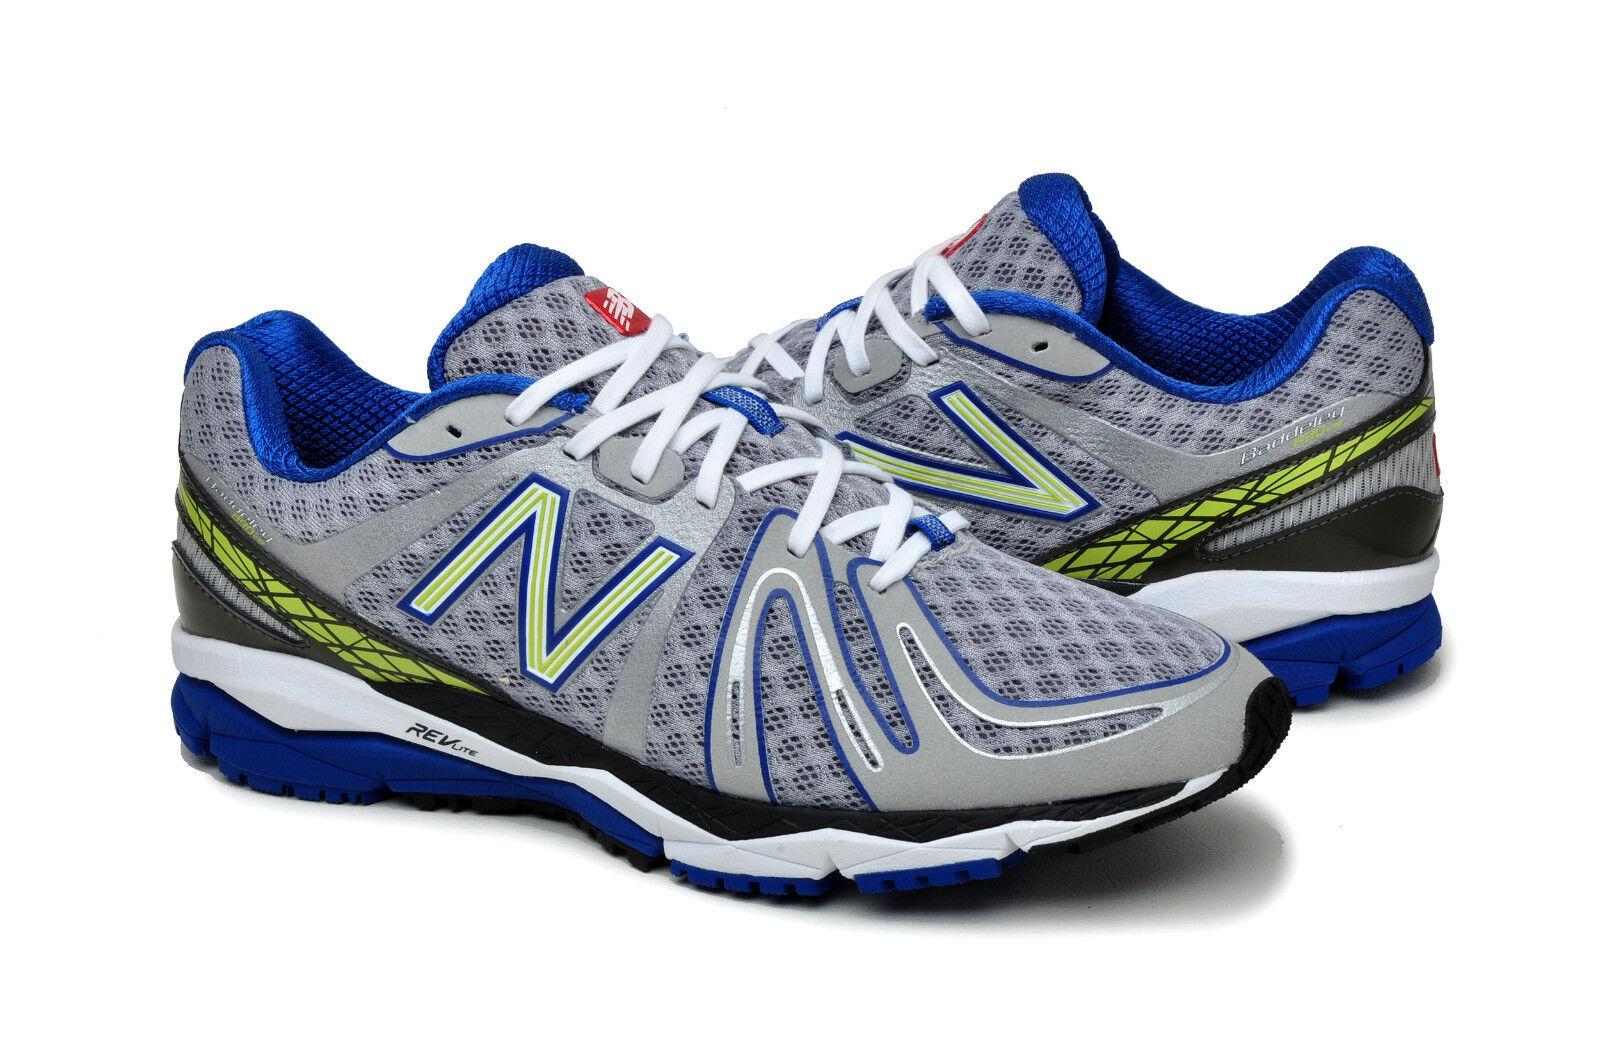 New Balance 890 890 890 Running shoes M890SB2 Grey bluee Black 261ff6